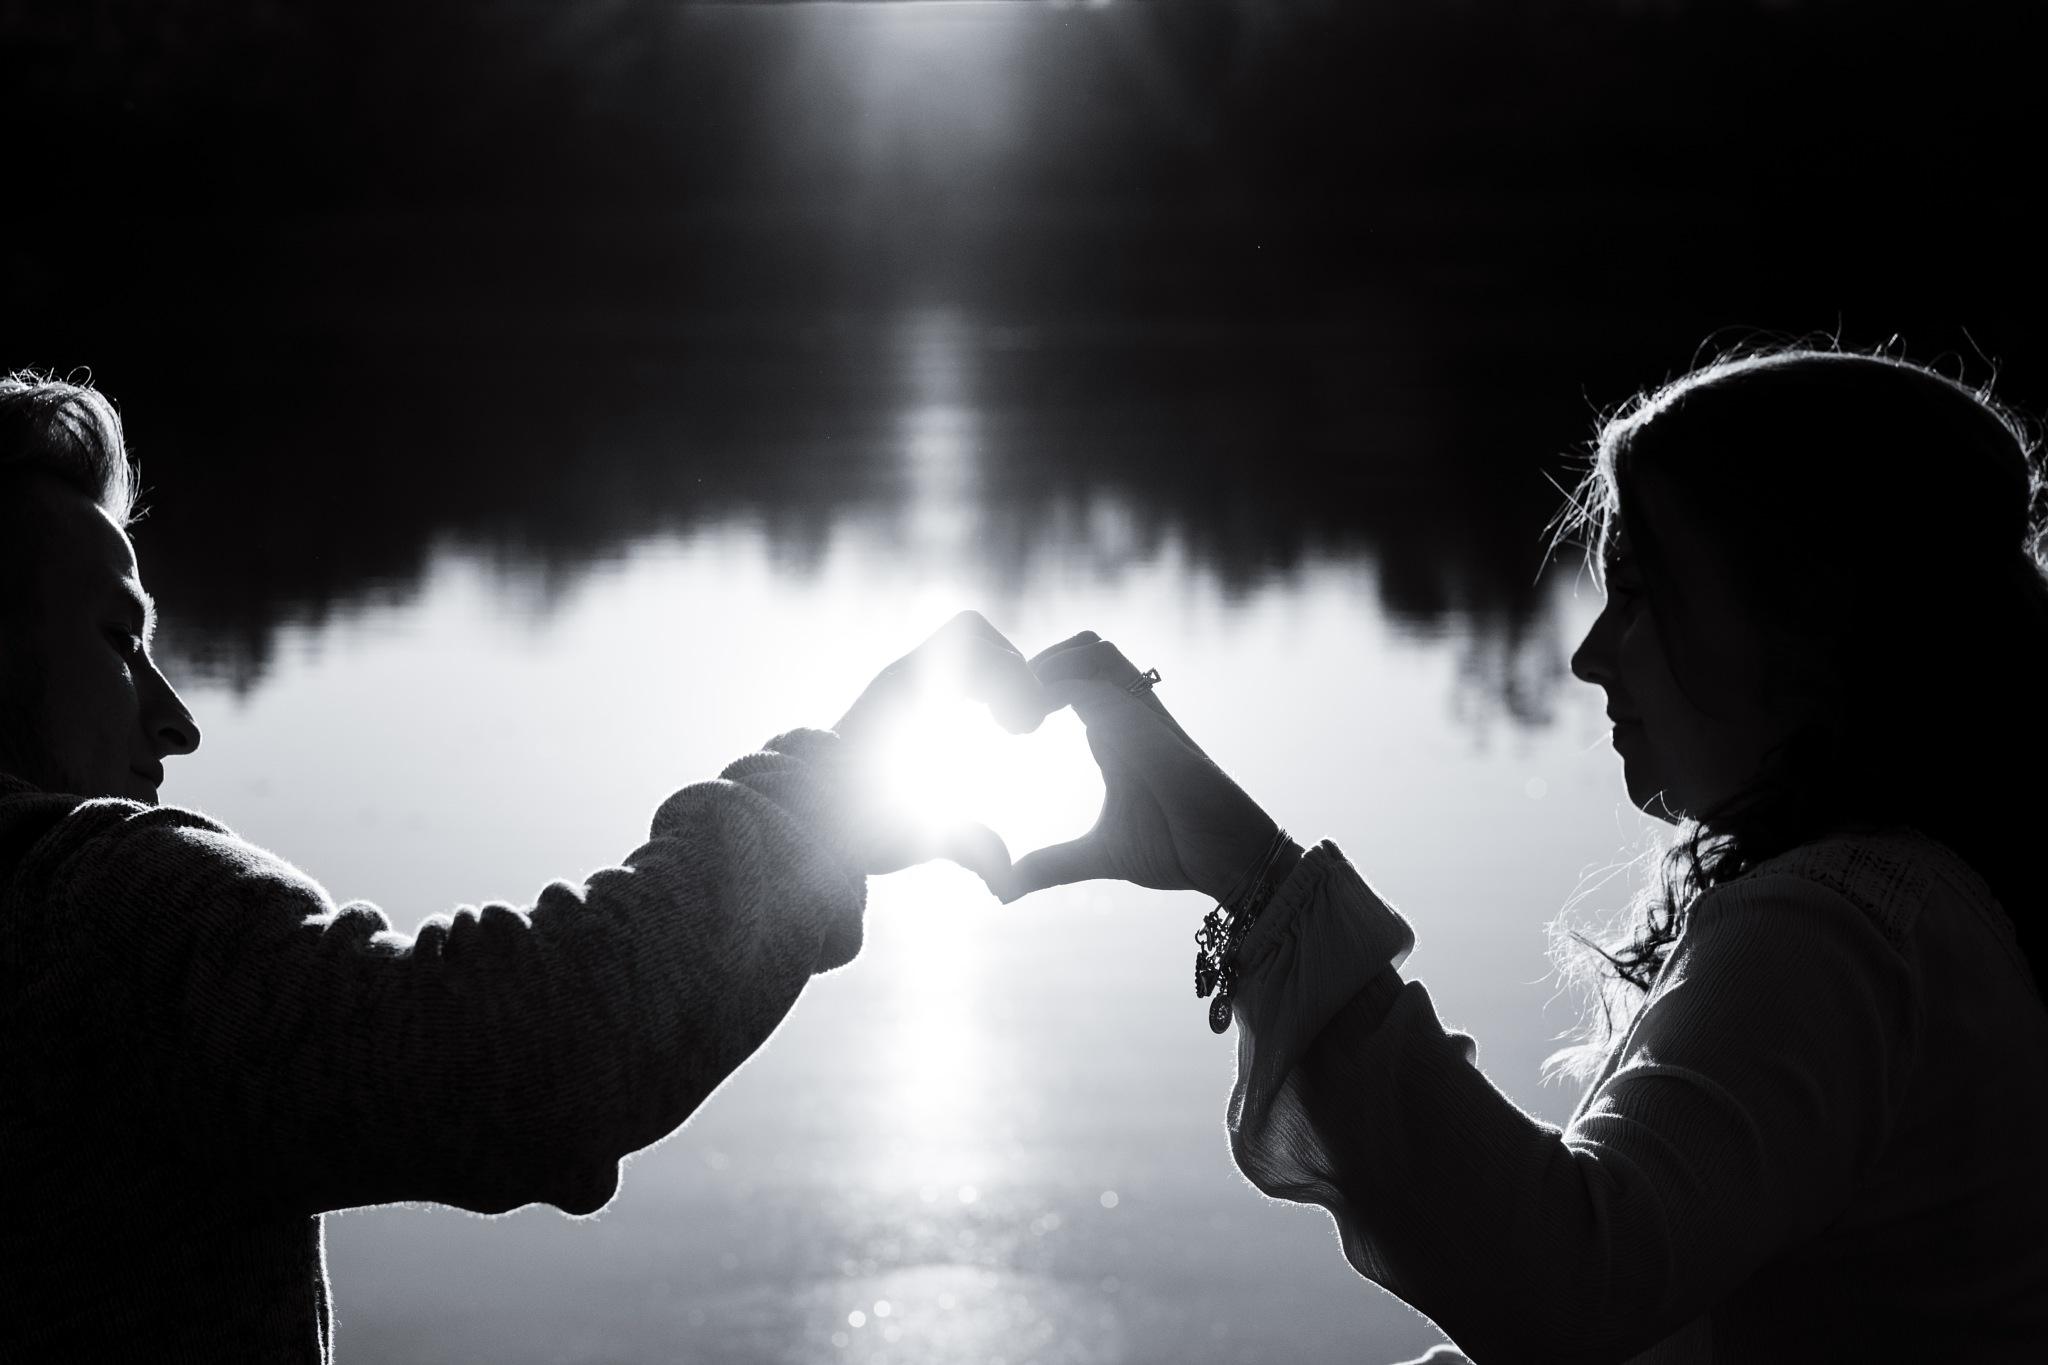 I Heart You by frametheworld365